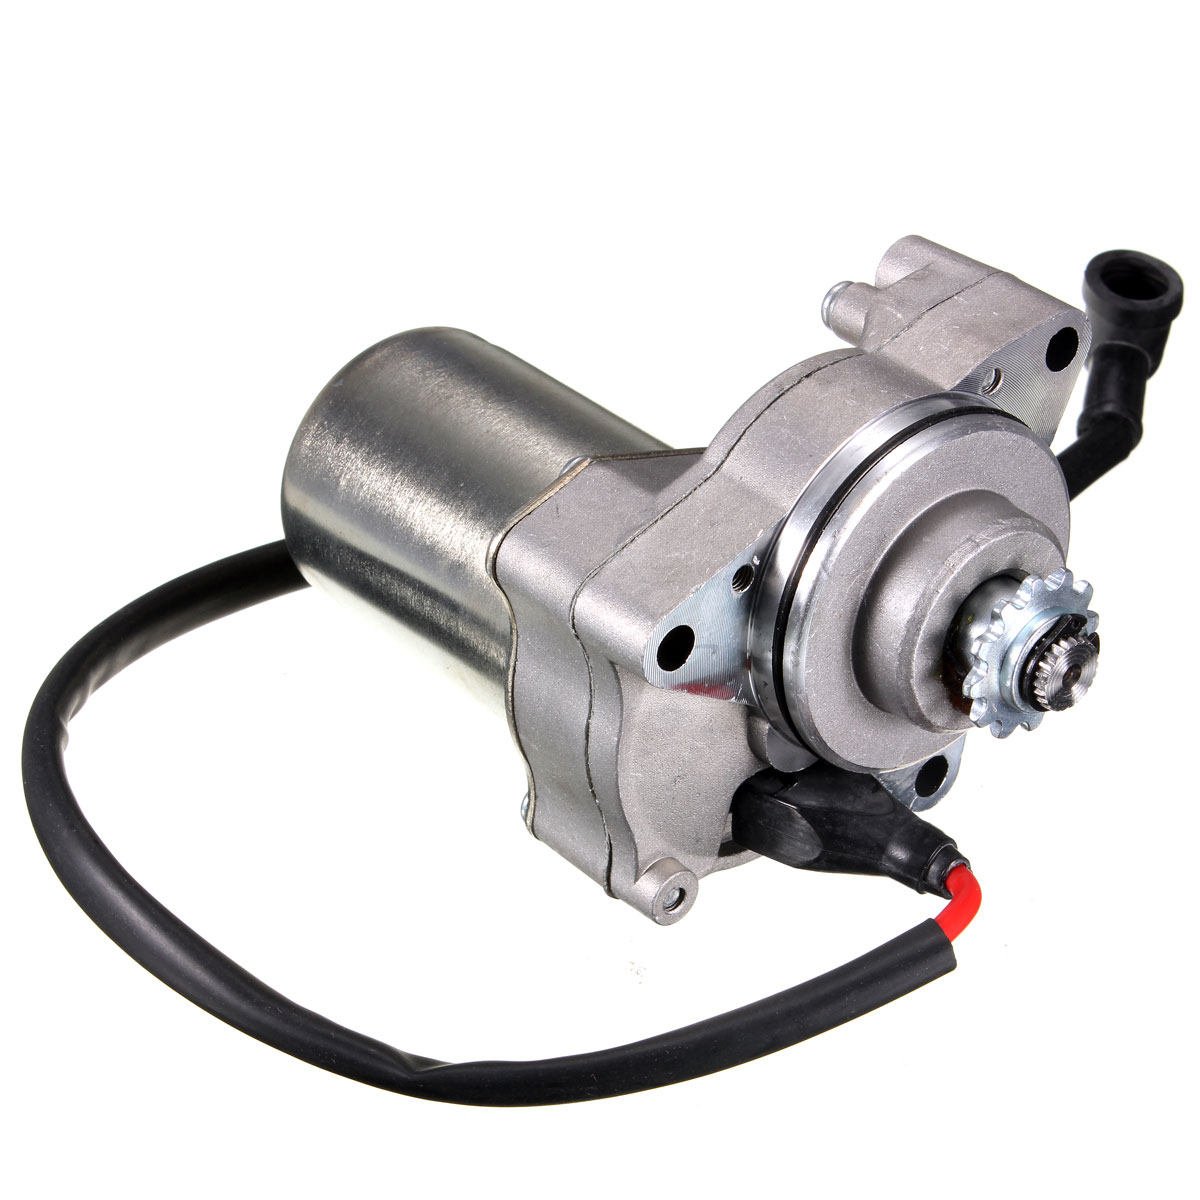 12v 48v 3 bolt motorbike atv electric starter motor for 50cc 90cc 110cc 4 stroke engine quad atv for honda kawasaki [ 1200 x 1200 Pixel ]